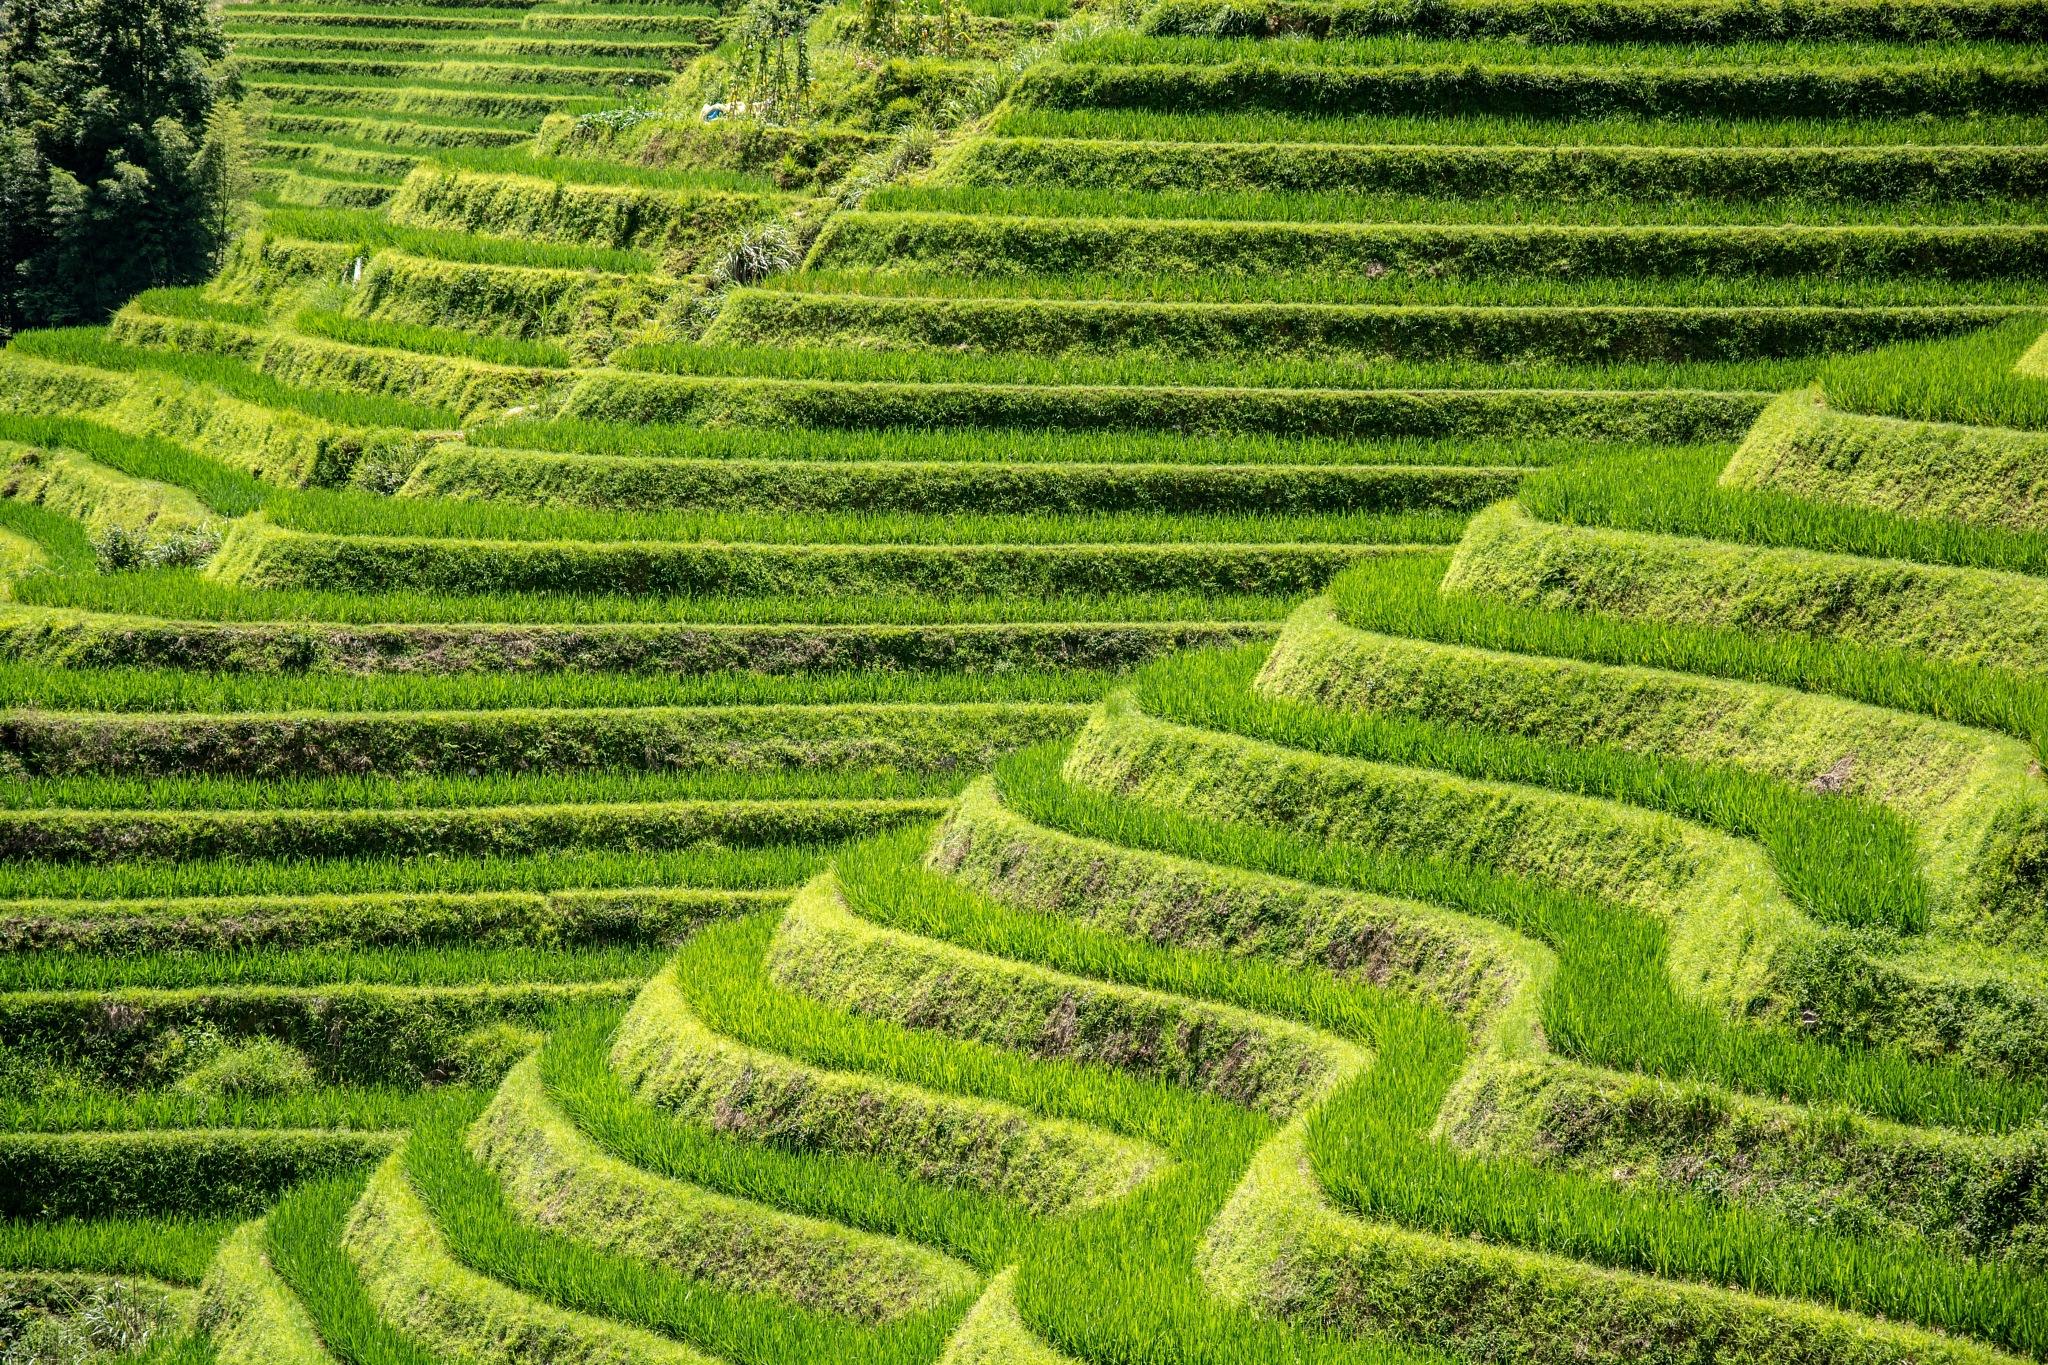 Rice terraces by Benjamin G.